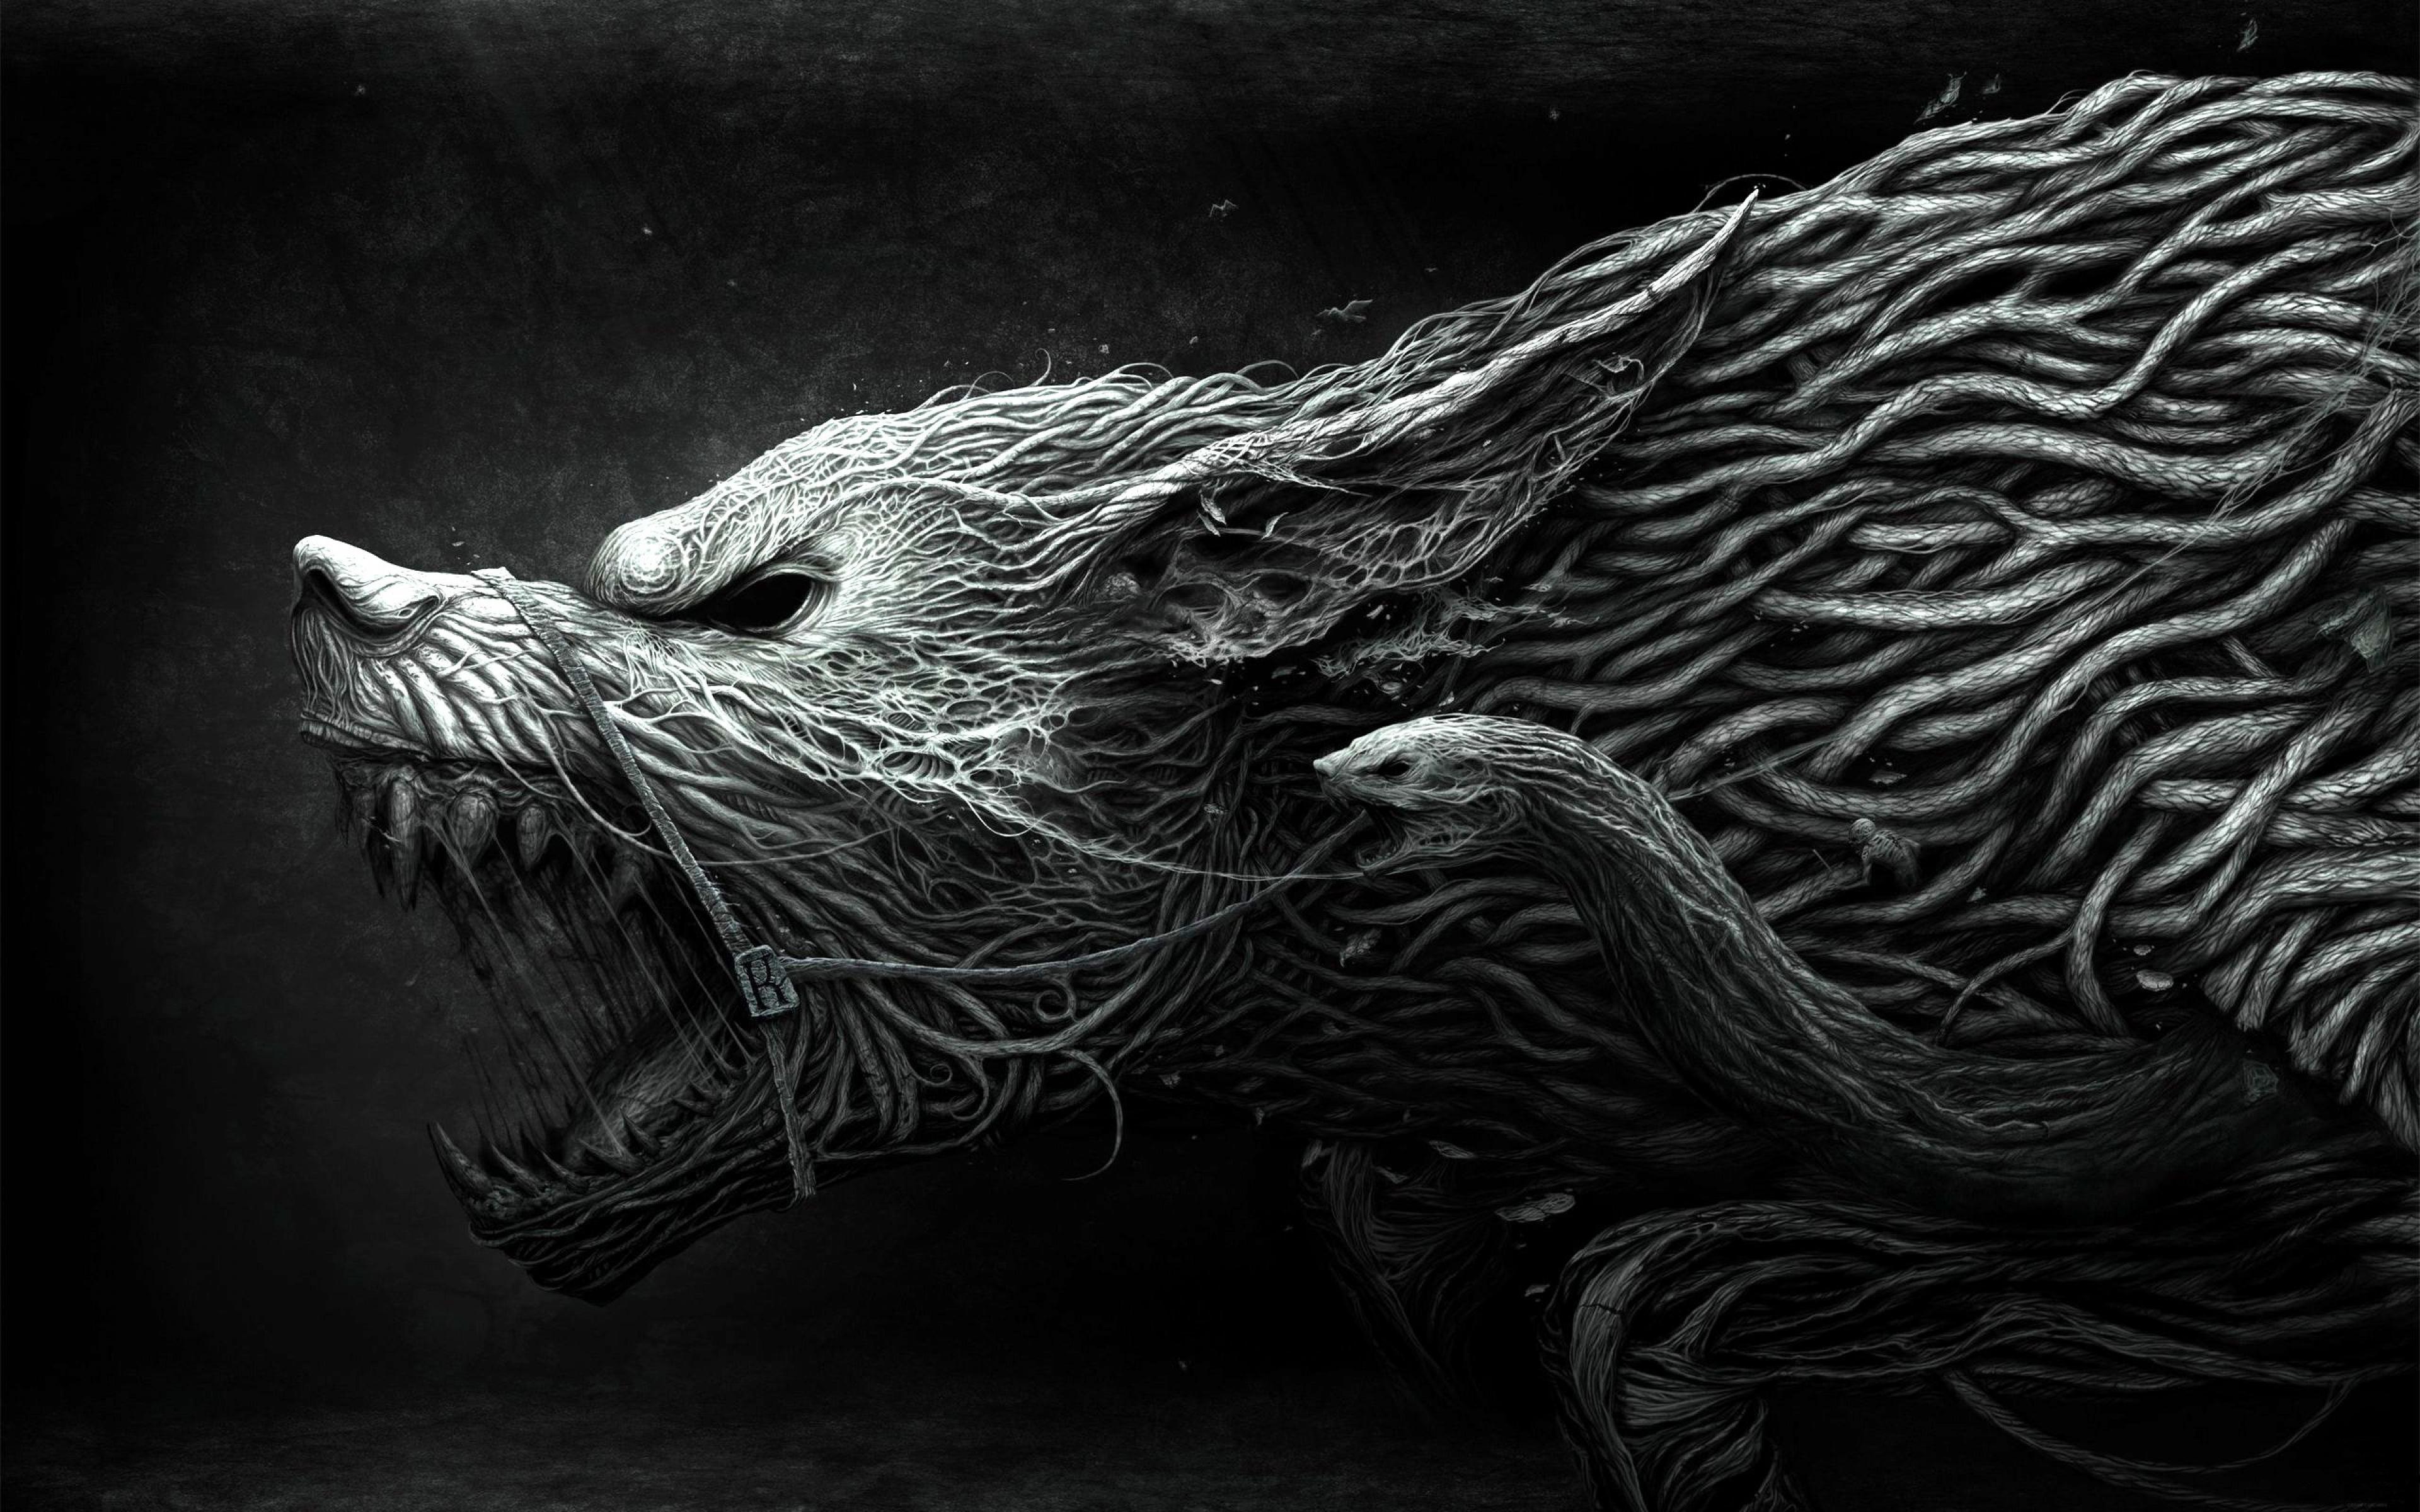 Download Wallpaper 3840x2400 Wolf Teeth Drawing Aggression Black 3840x2400